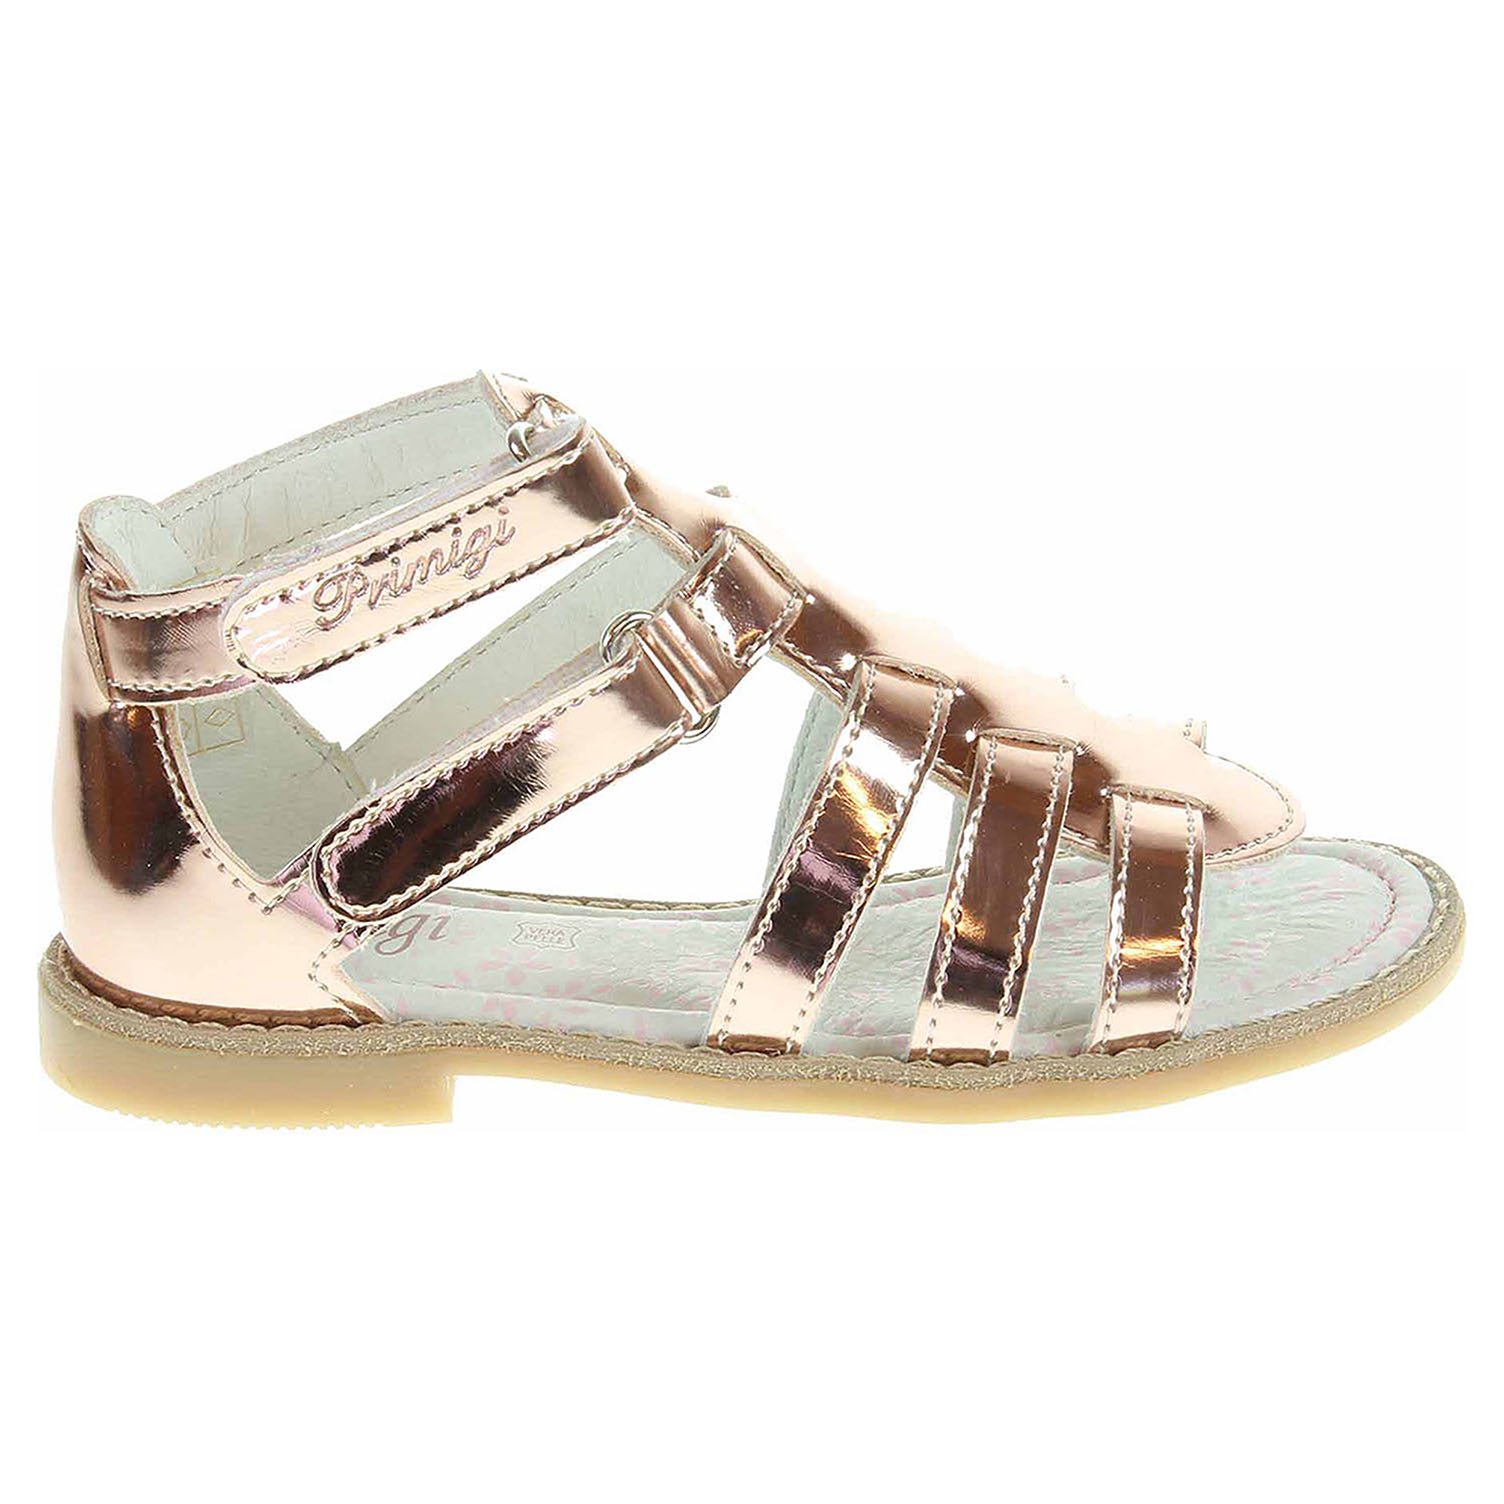 Ecco Primigi dívčí sandály 7098000 růžové 26100117